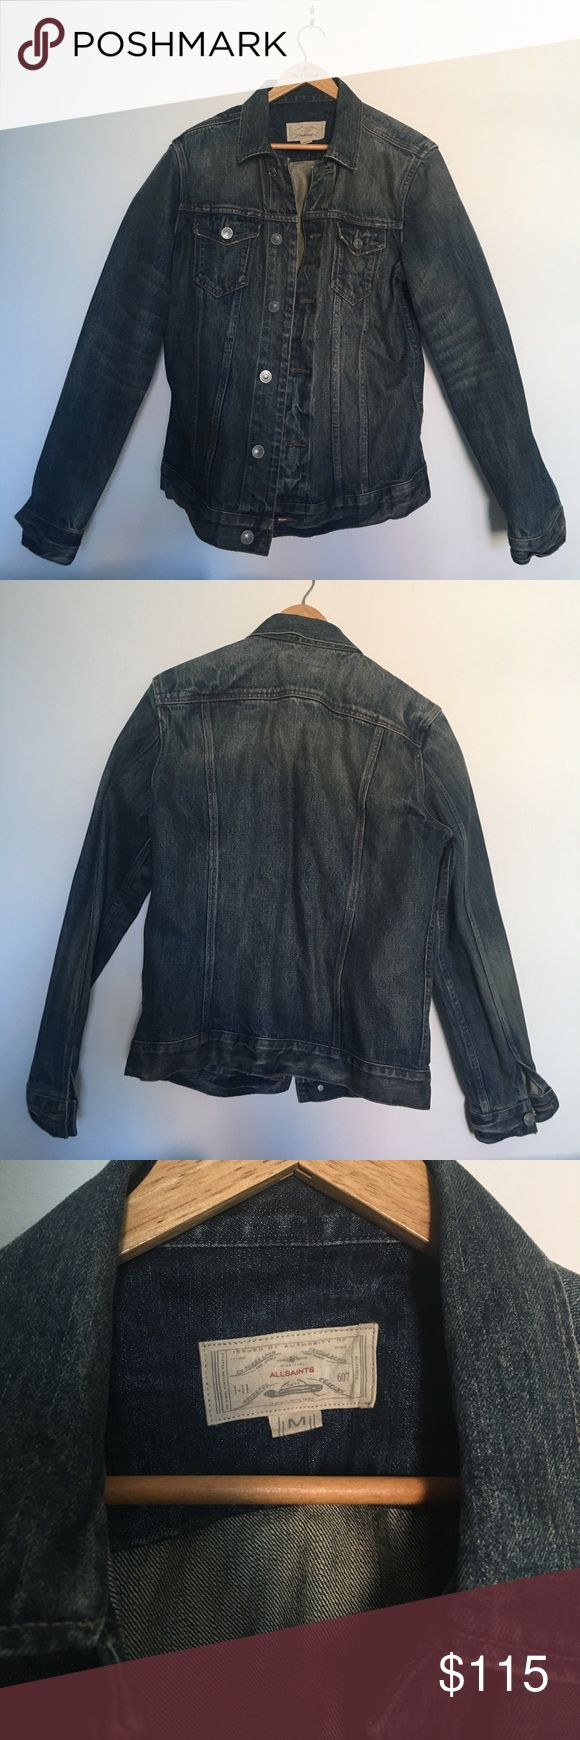 All Saints men's denim jacket Men's denim jacket from All Saints. Barely worn, in great shape. All Saints Jackets & Coats